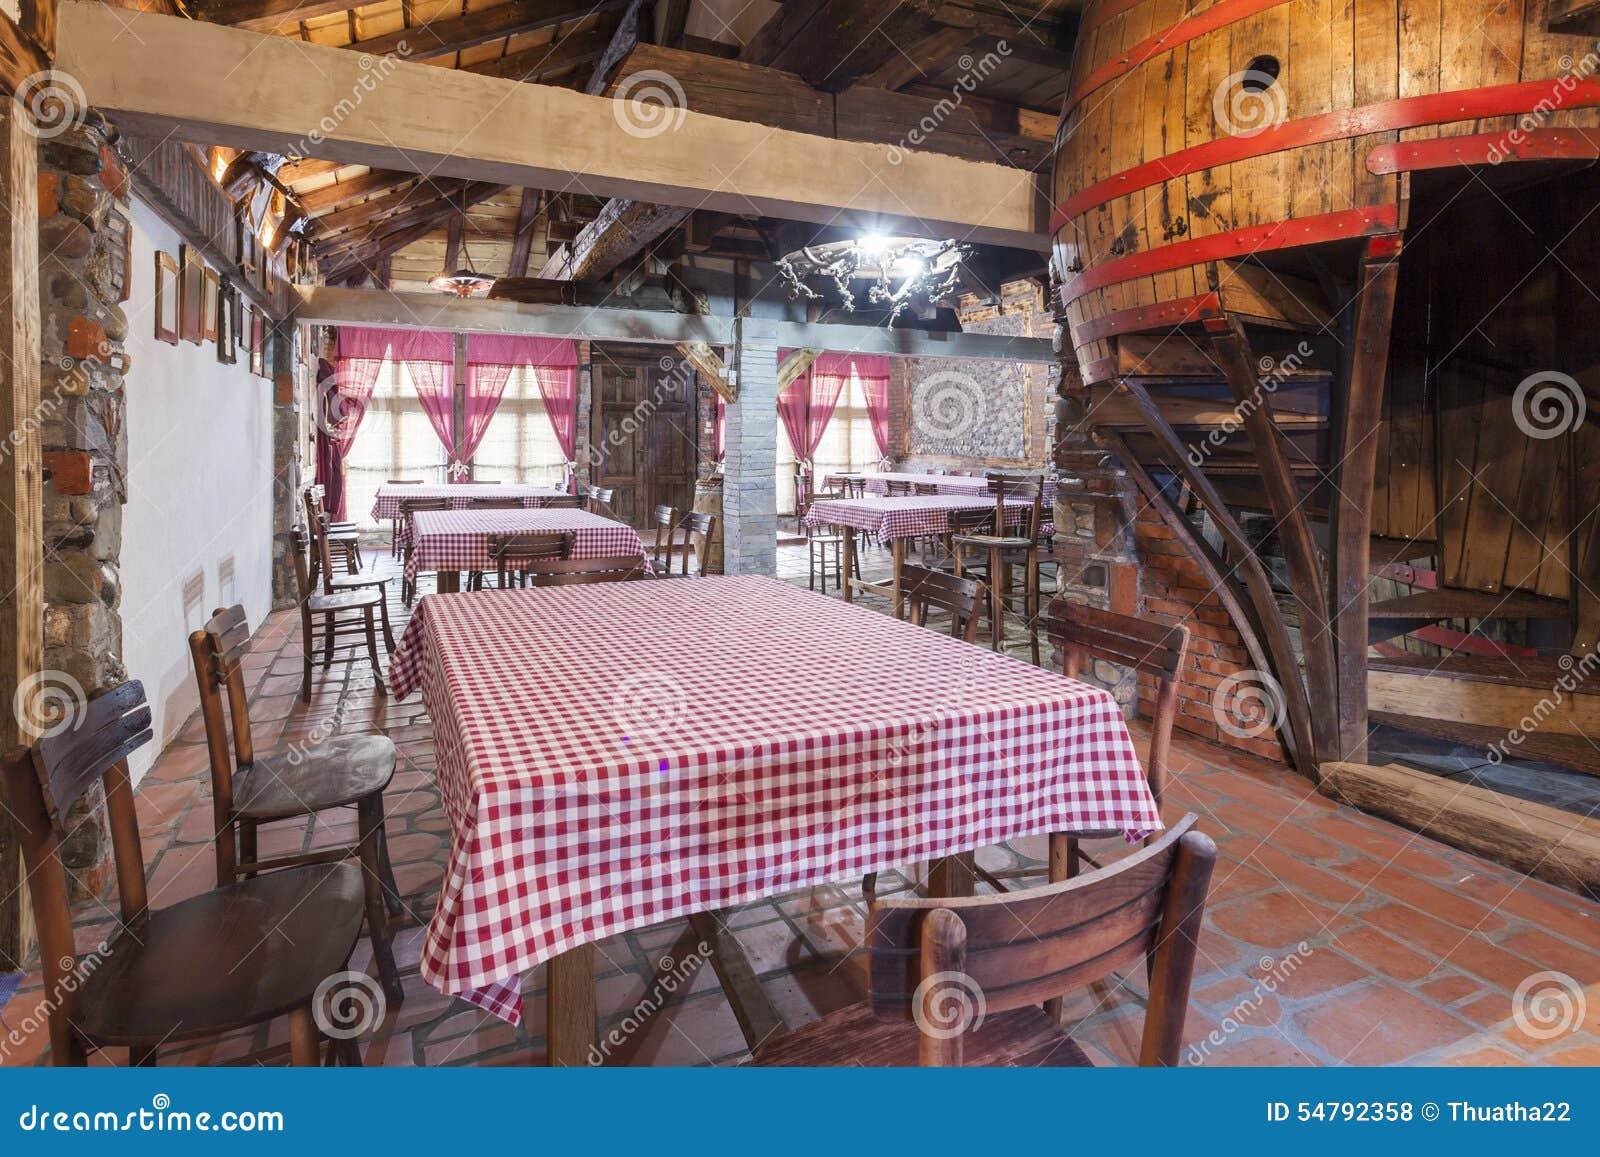 Piastrelle cucina for Piastrelle cucina ristorante